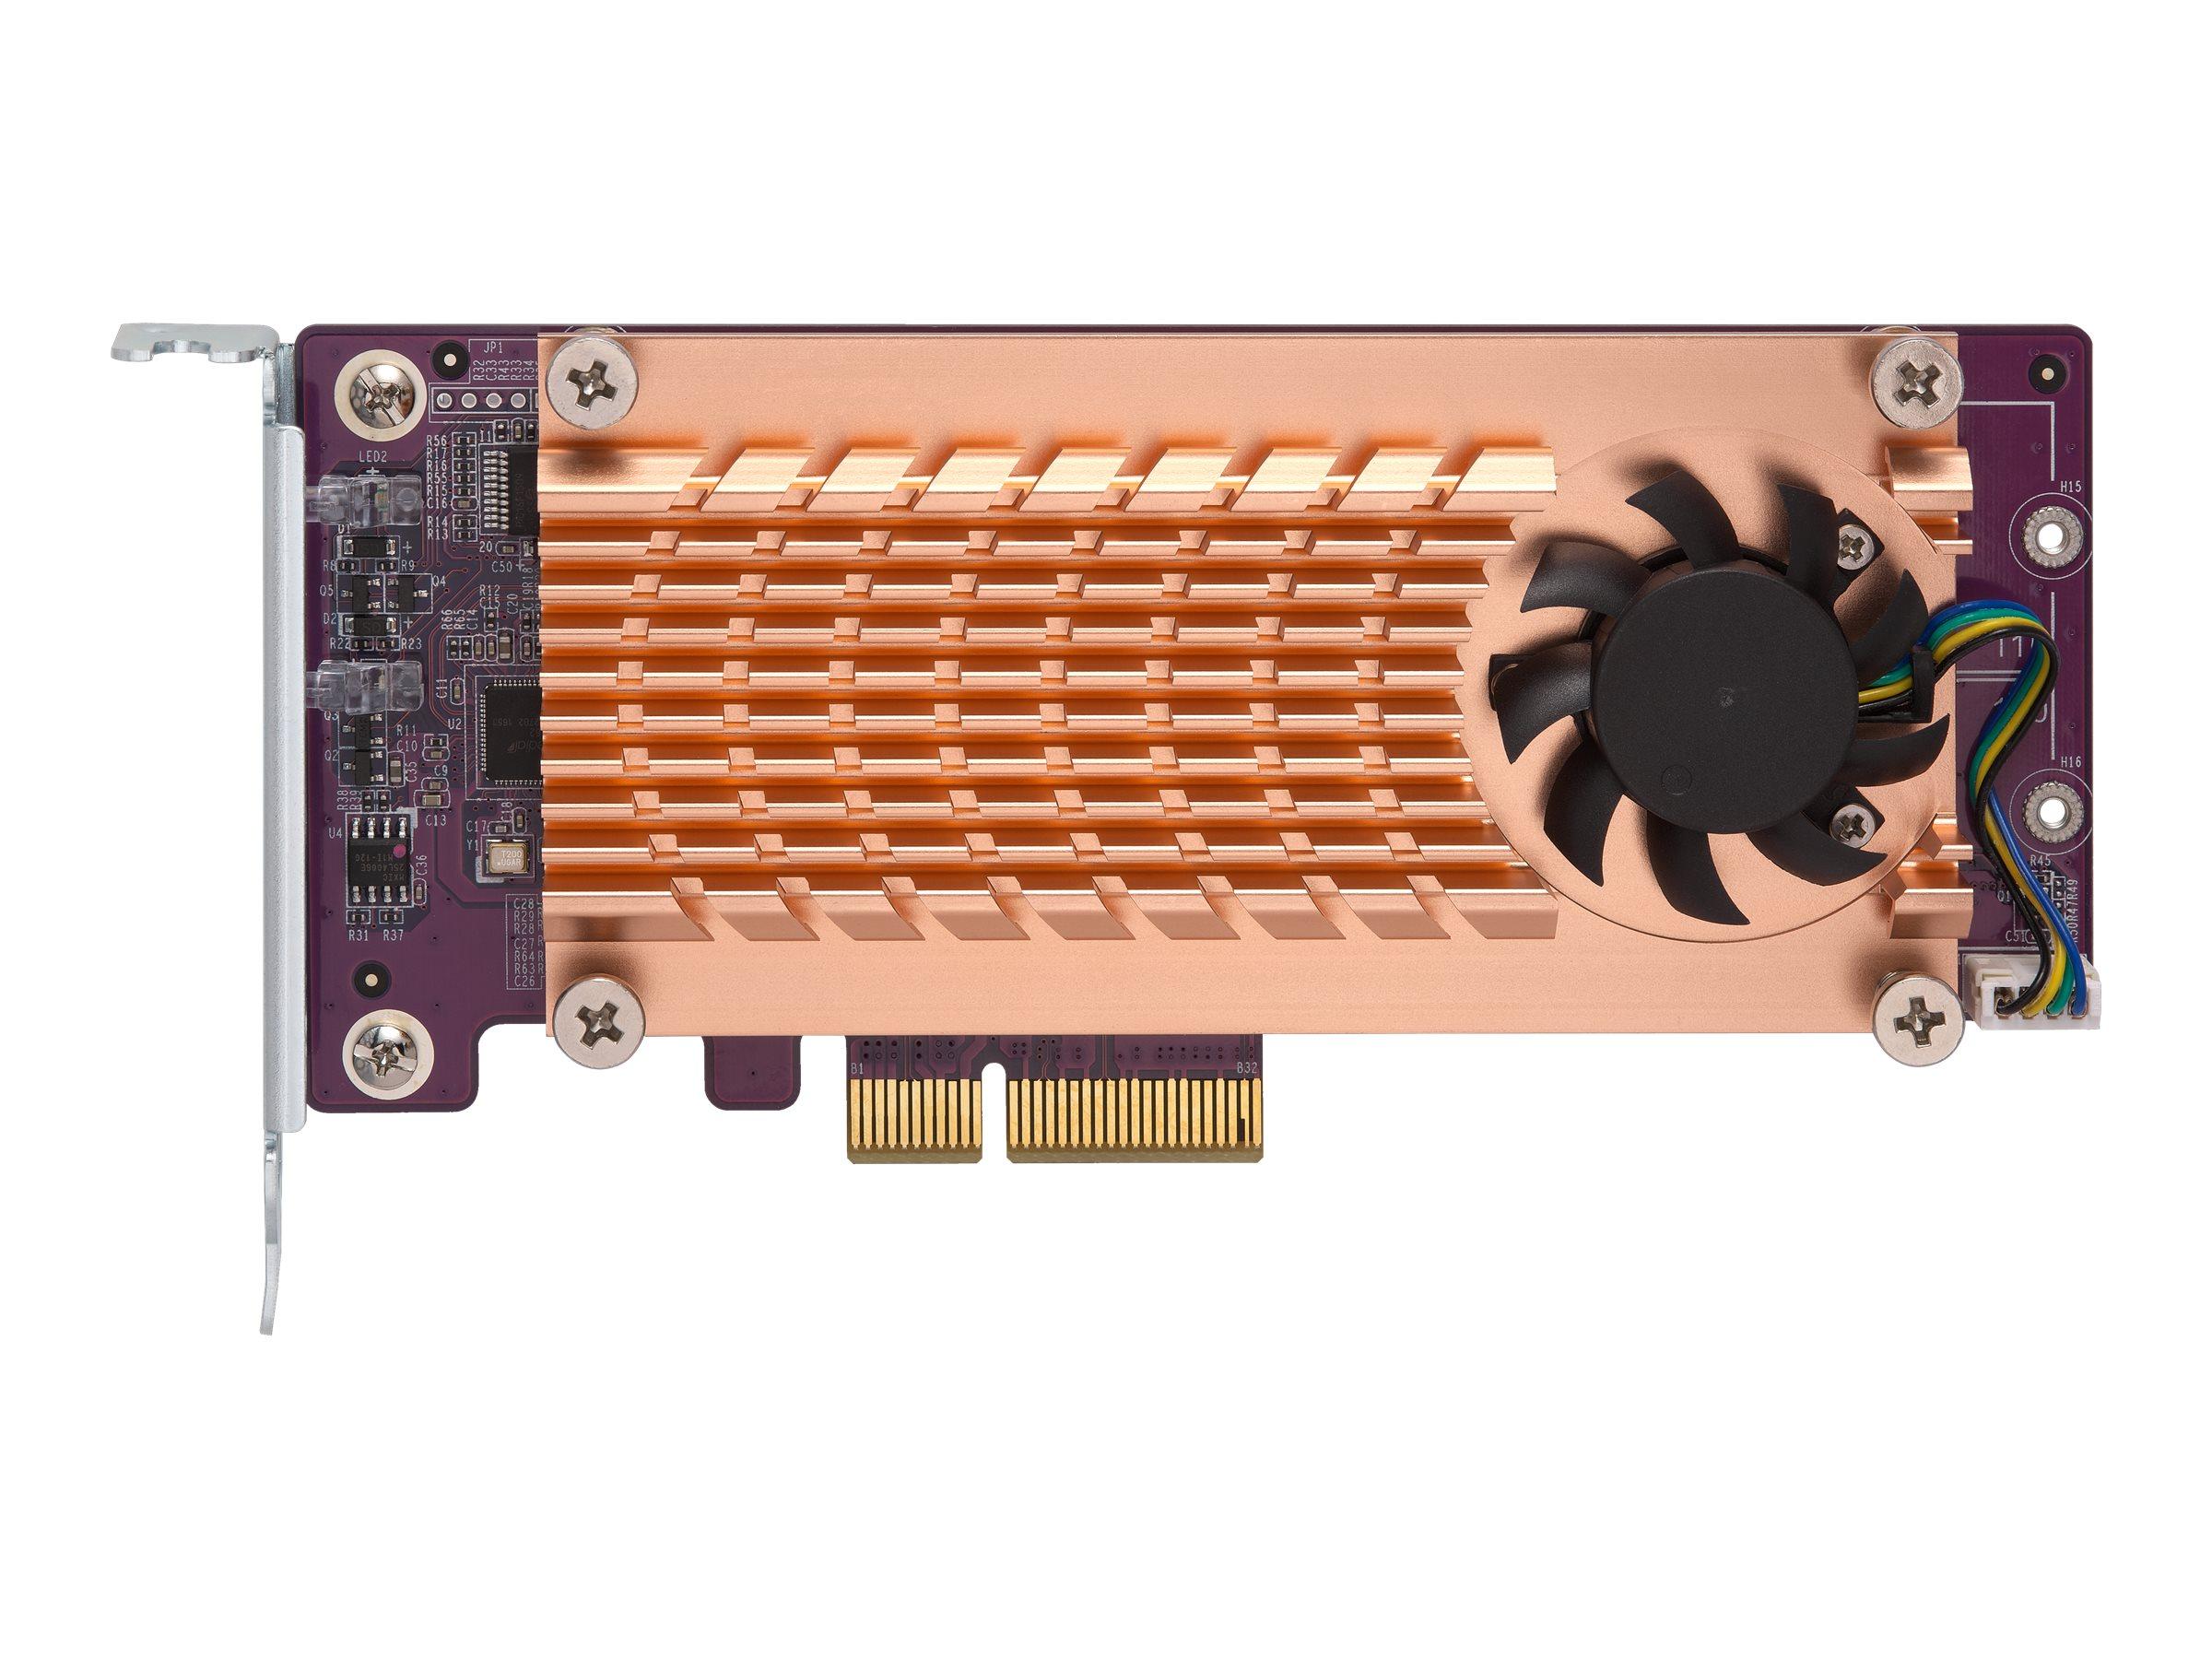 QNAP QM2-2S-220A - Speicher-Controller - SATA Low-Profile